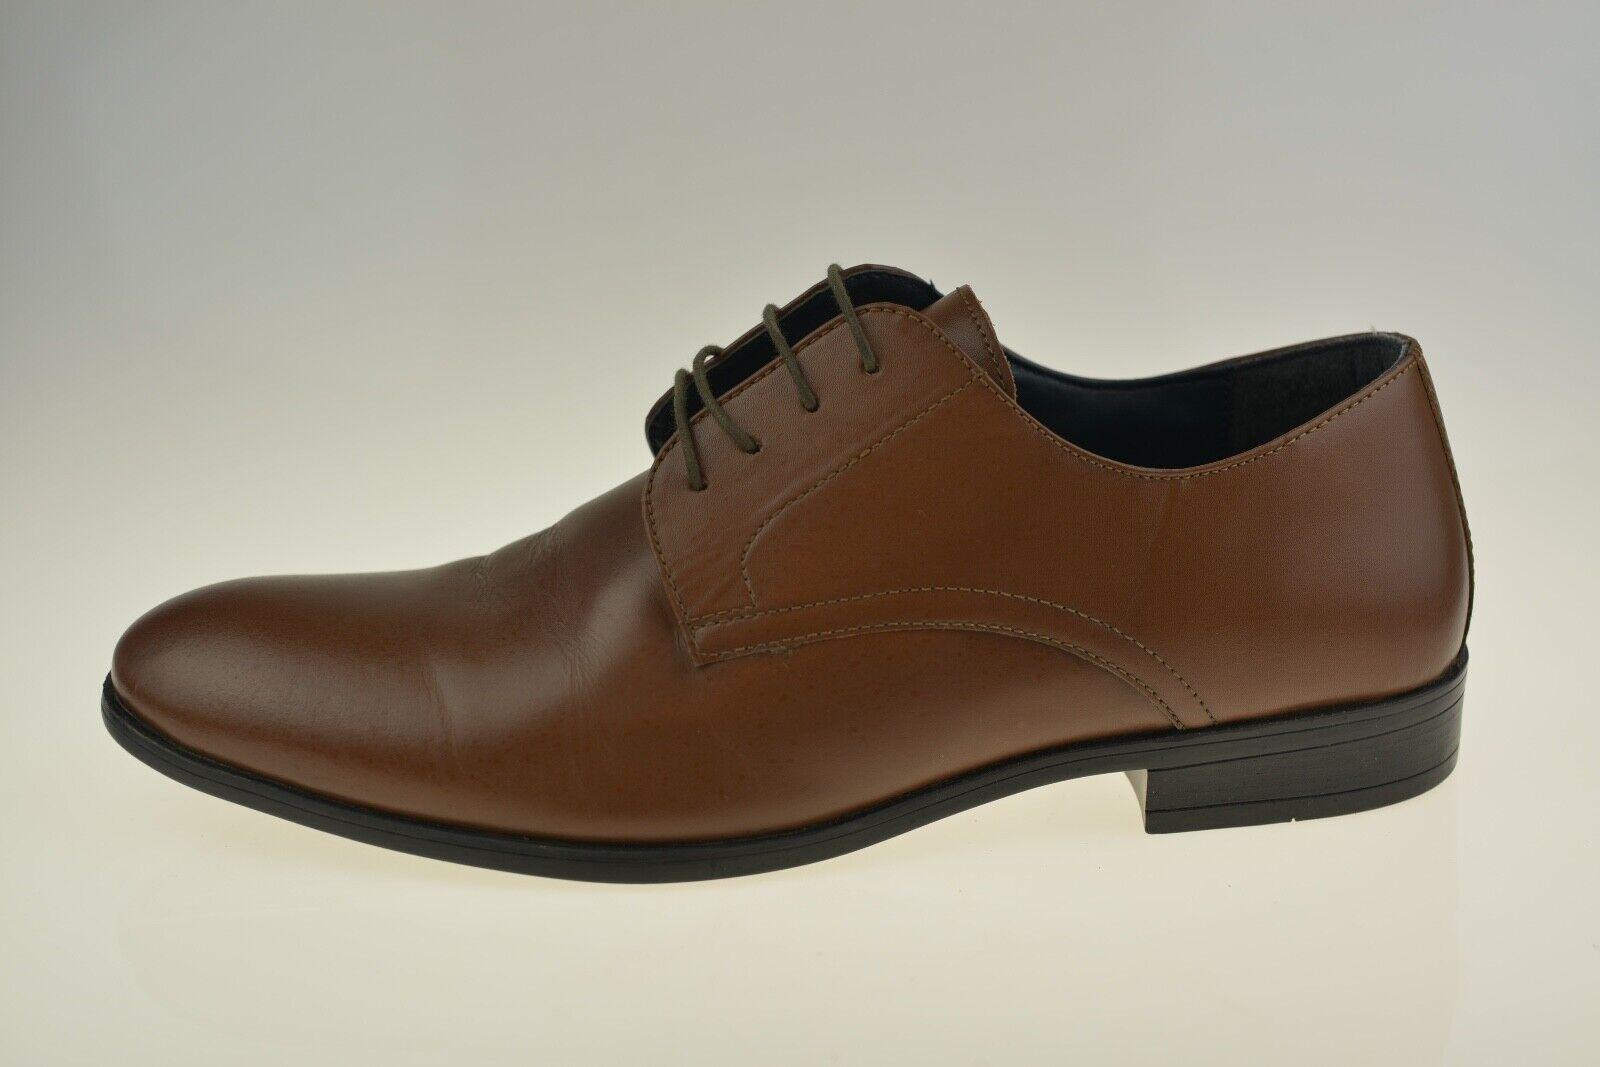 Next Design ST 1982 Brown Leather Men's Shoes Size Uk 10